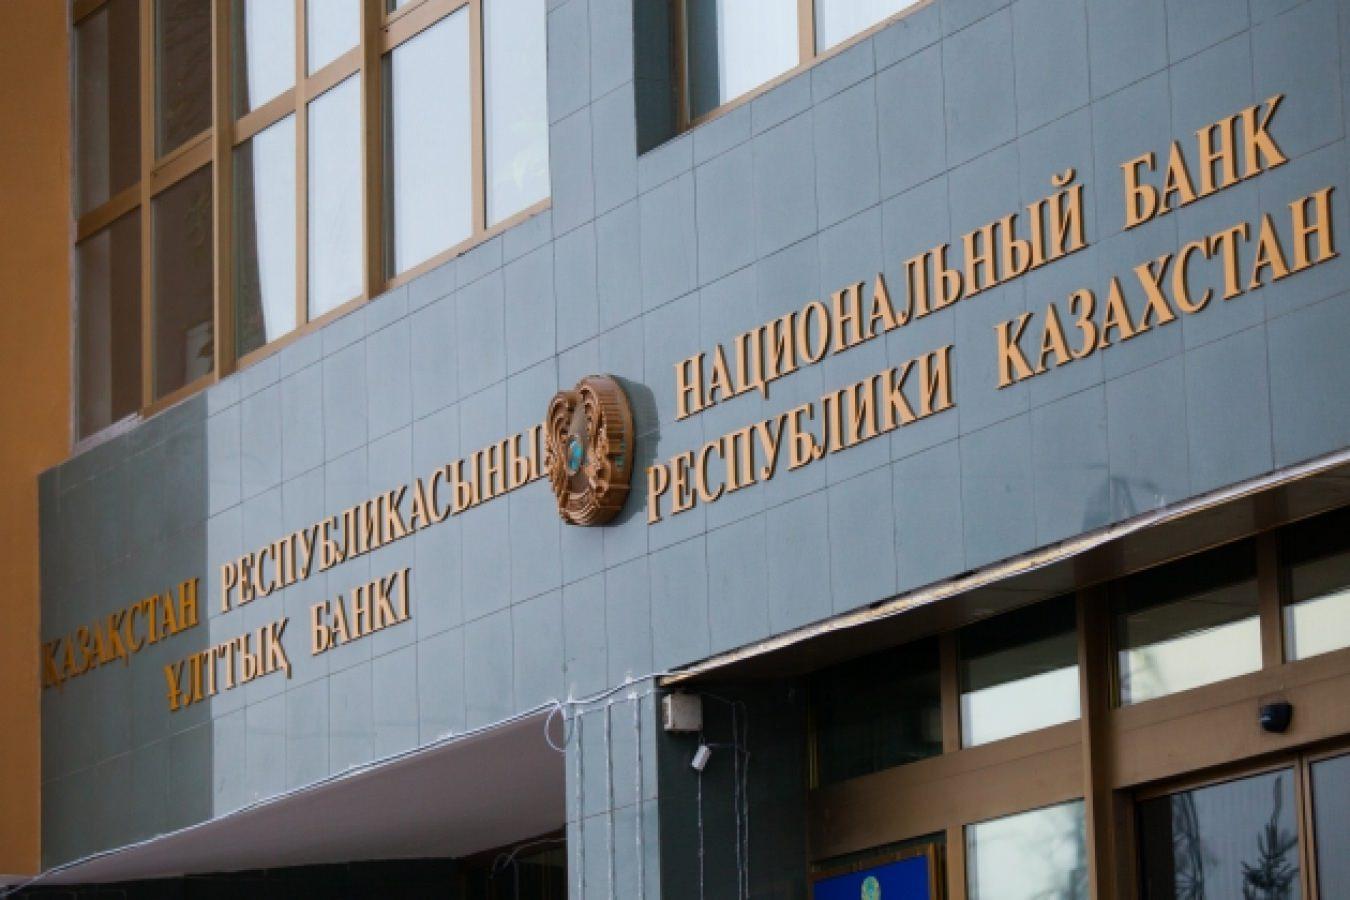 Внешний долг Казахстана за год сократился на 5,4%